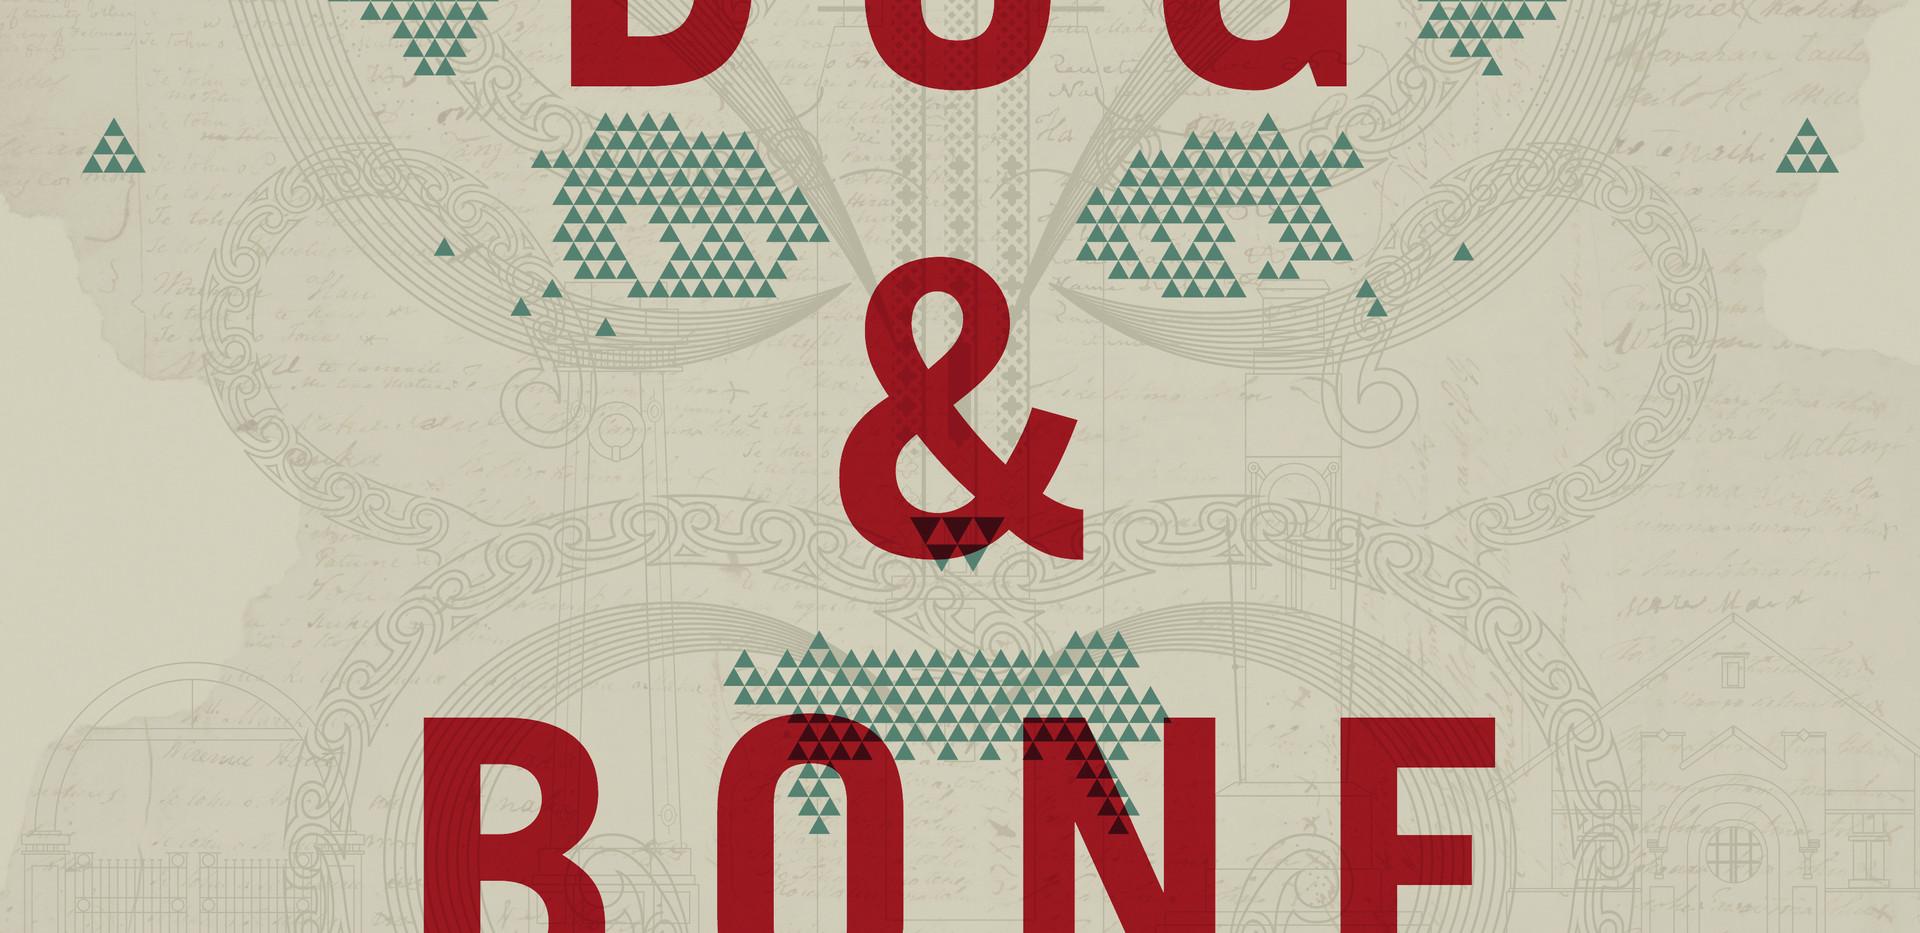 Dog & Bone - poster image by Tim Hansen